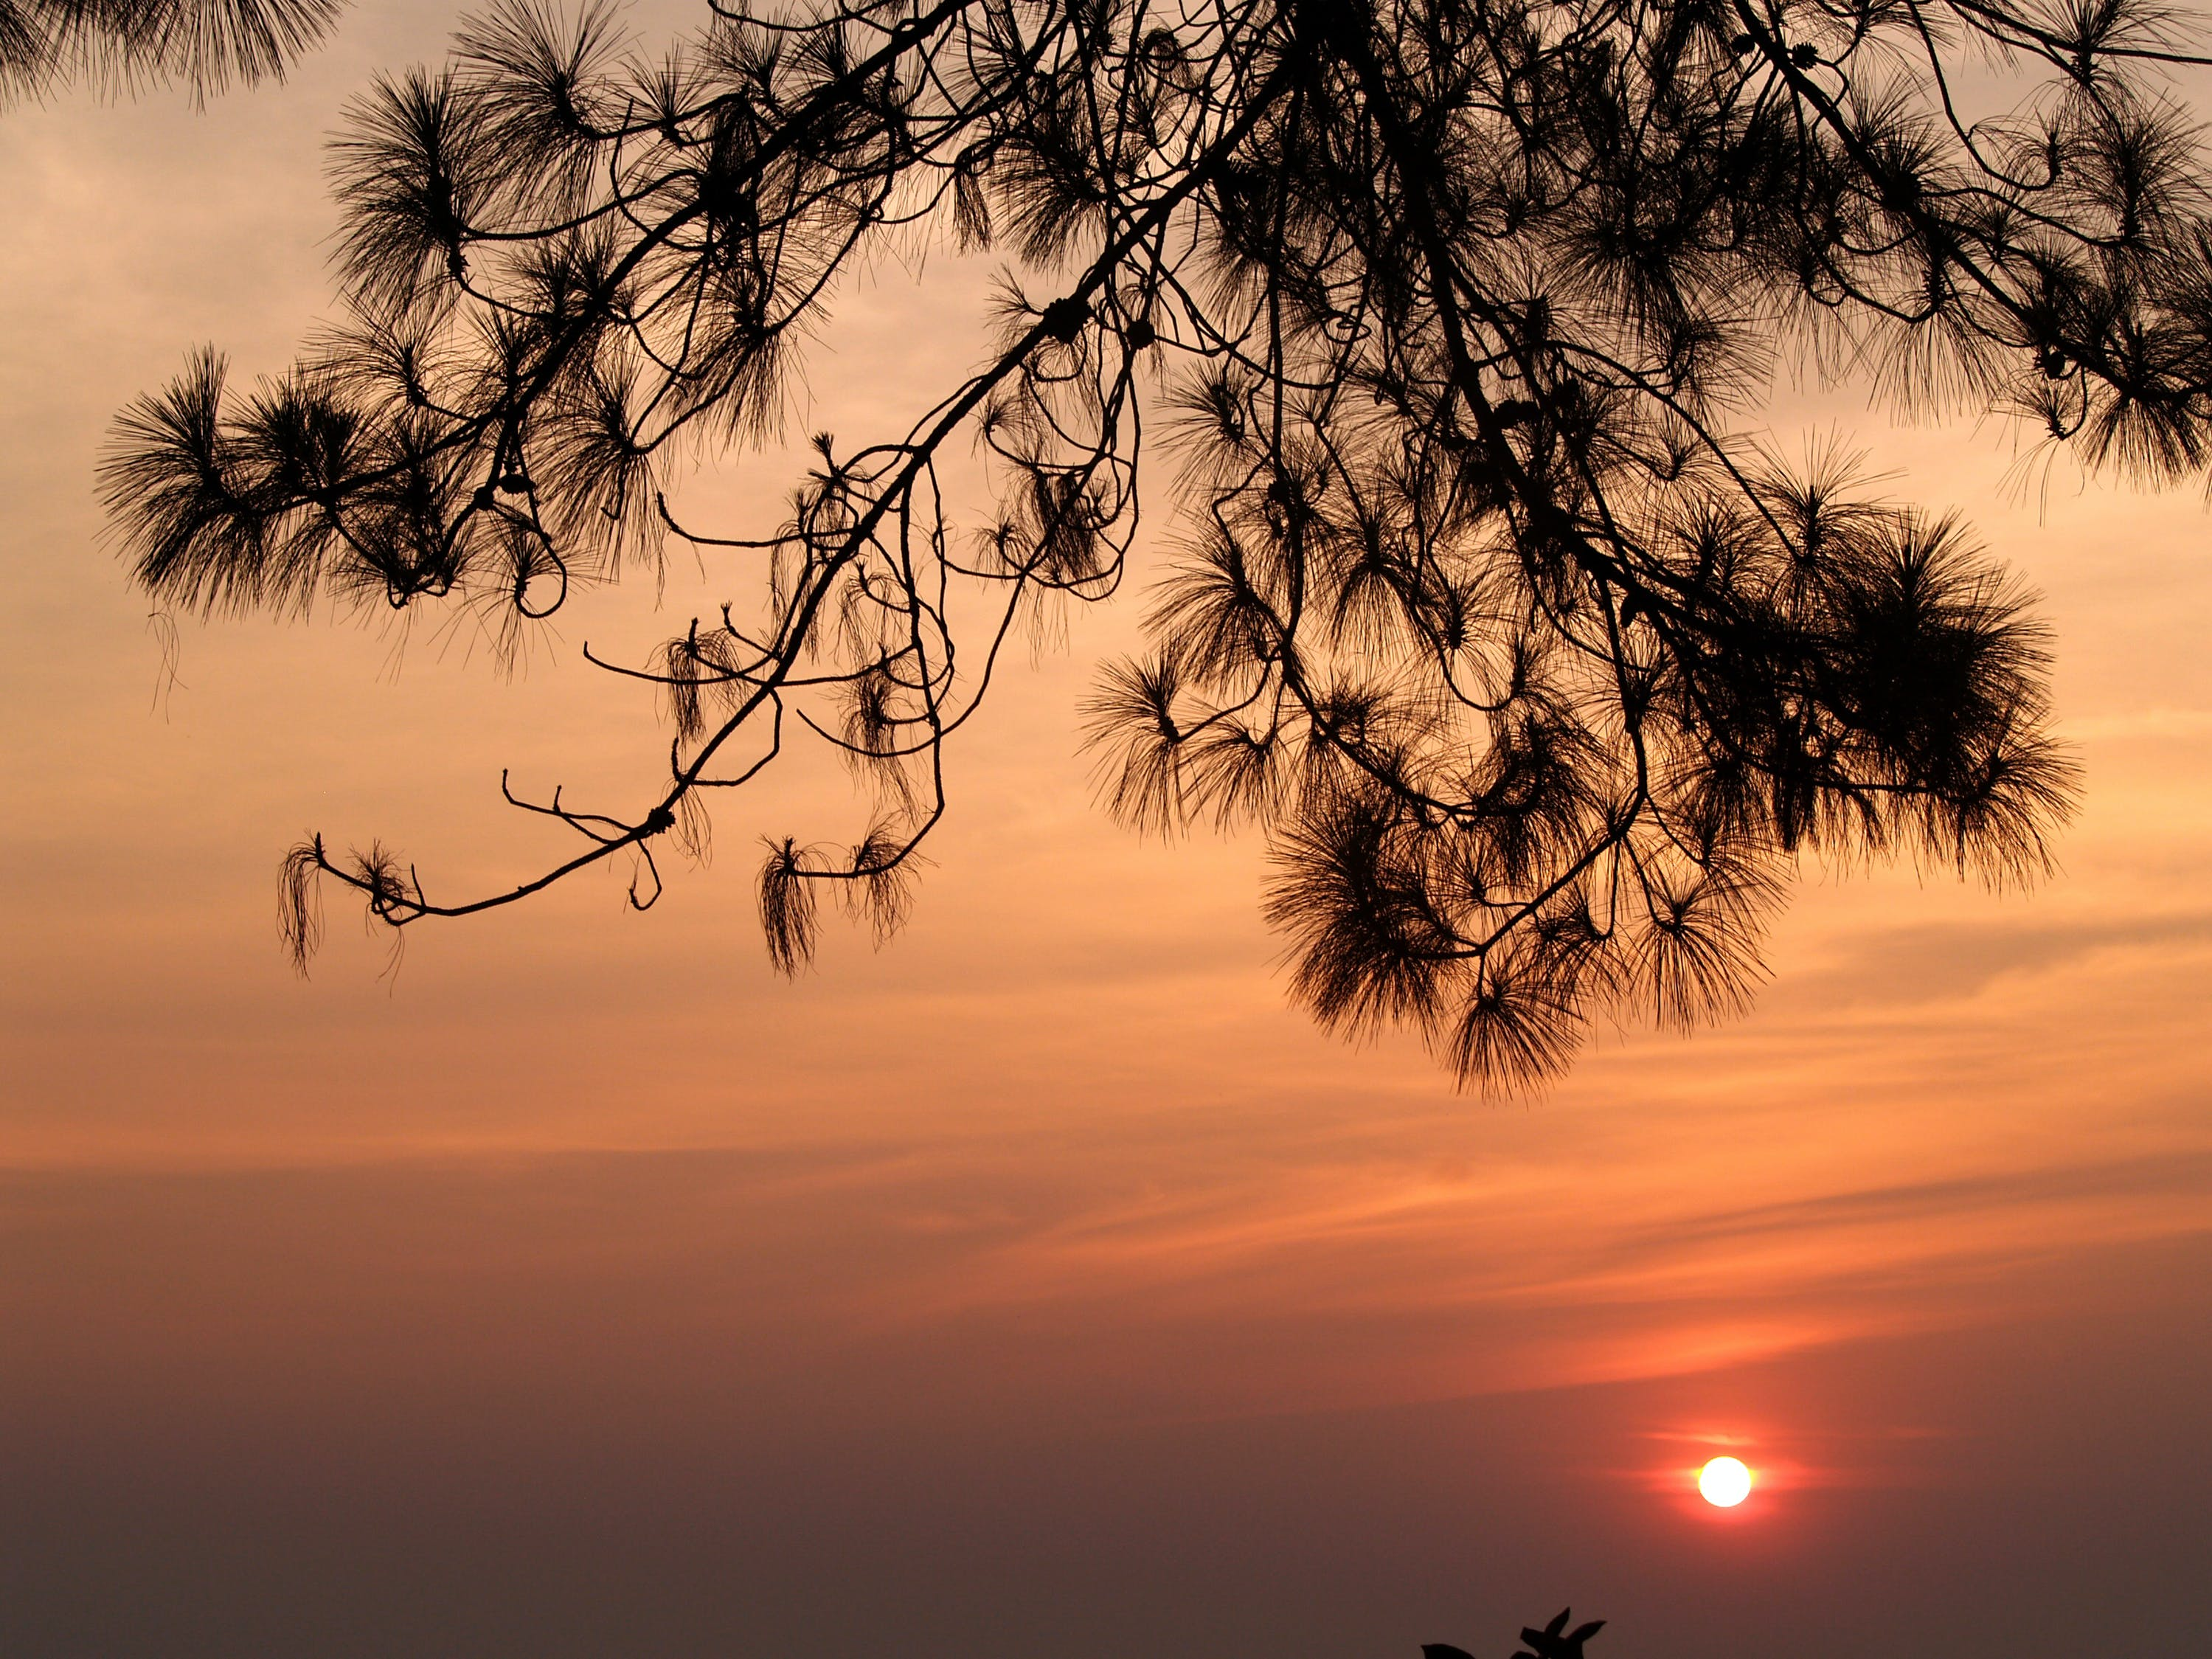 Gratis arkivbilde med bakbelysning, daggry, gren, himmel